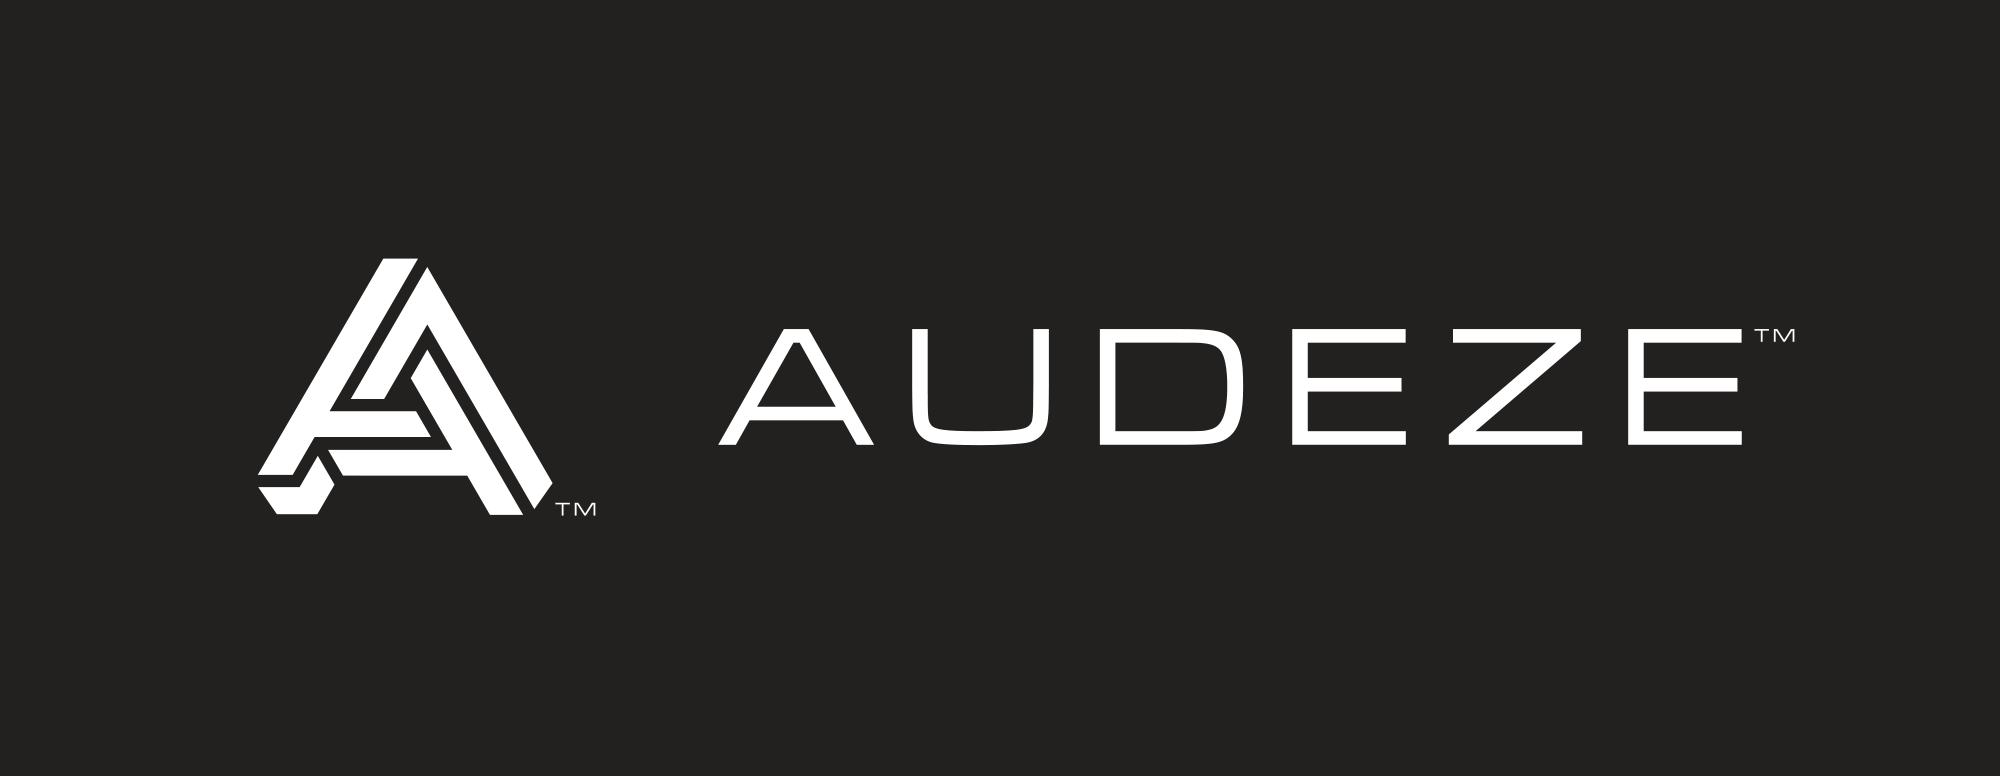 Audeze